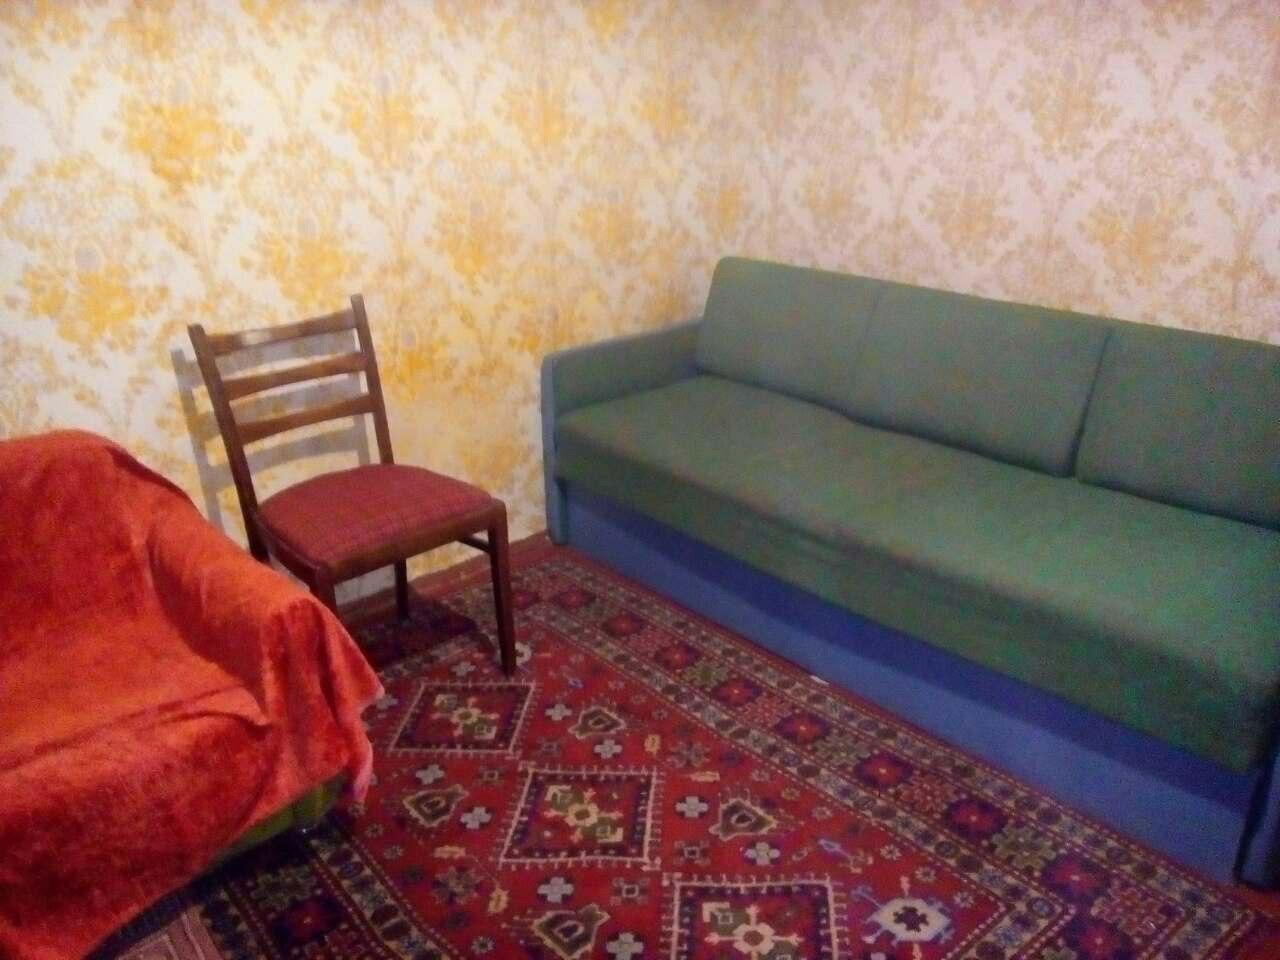 Сдам долгосрочно комната, г. Киев                               в р-не Беличи                                 фото